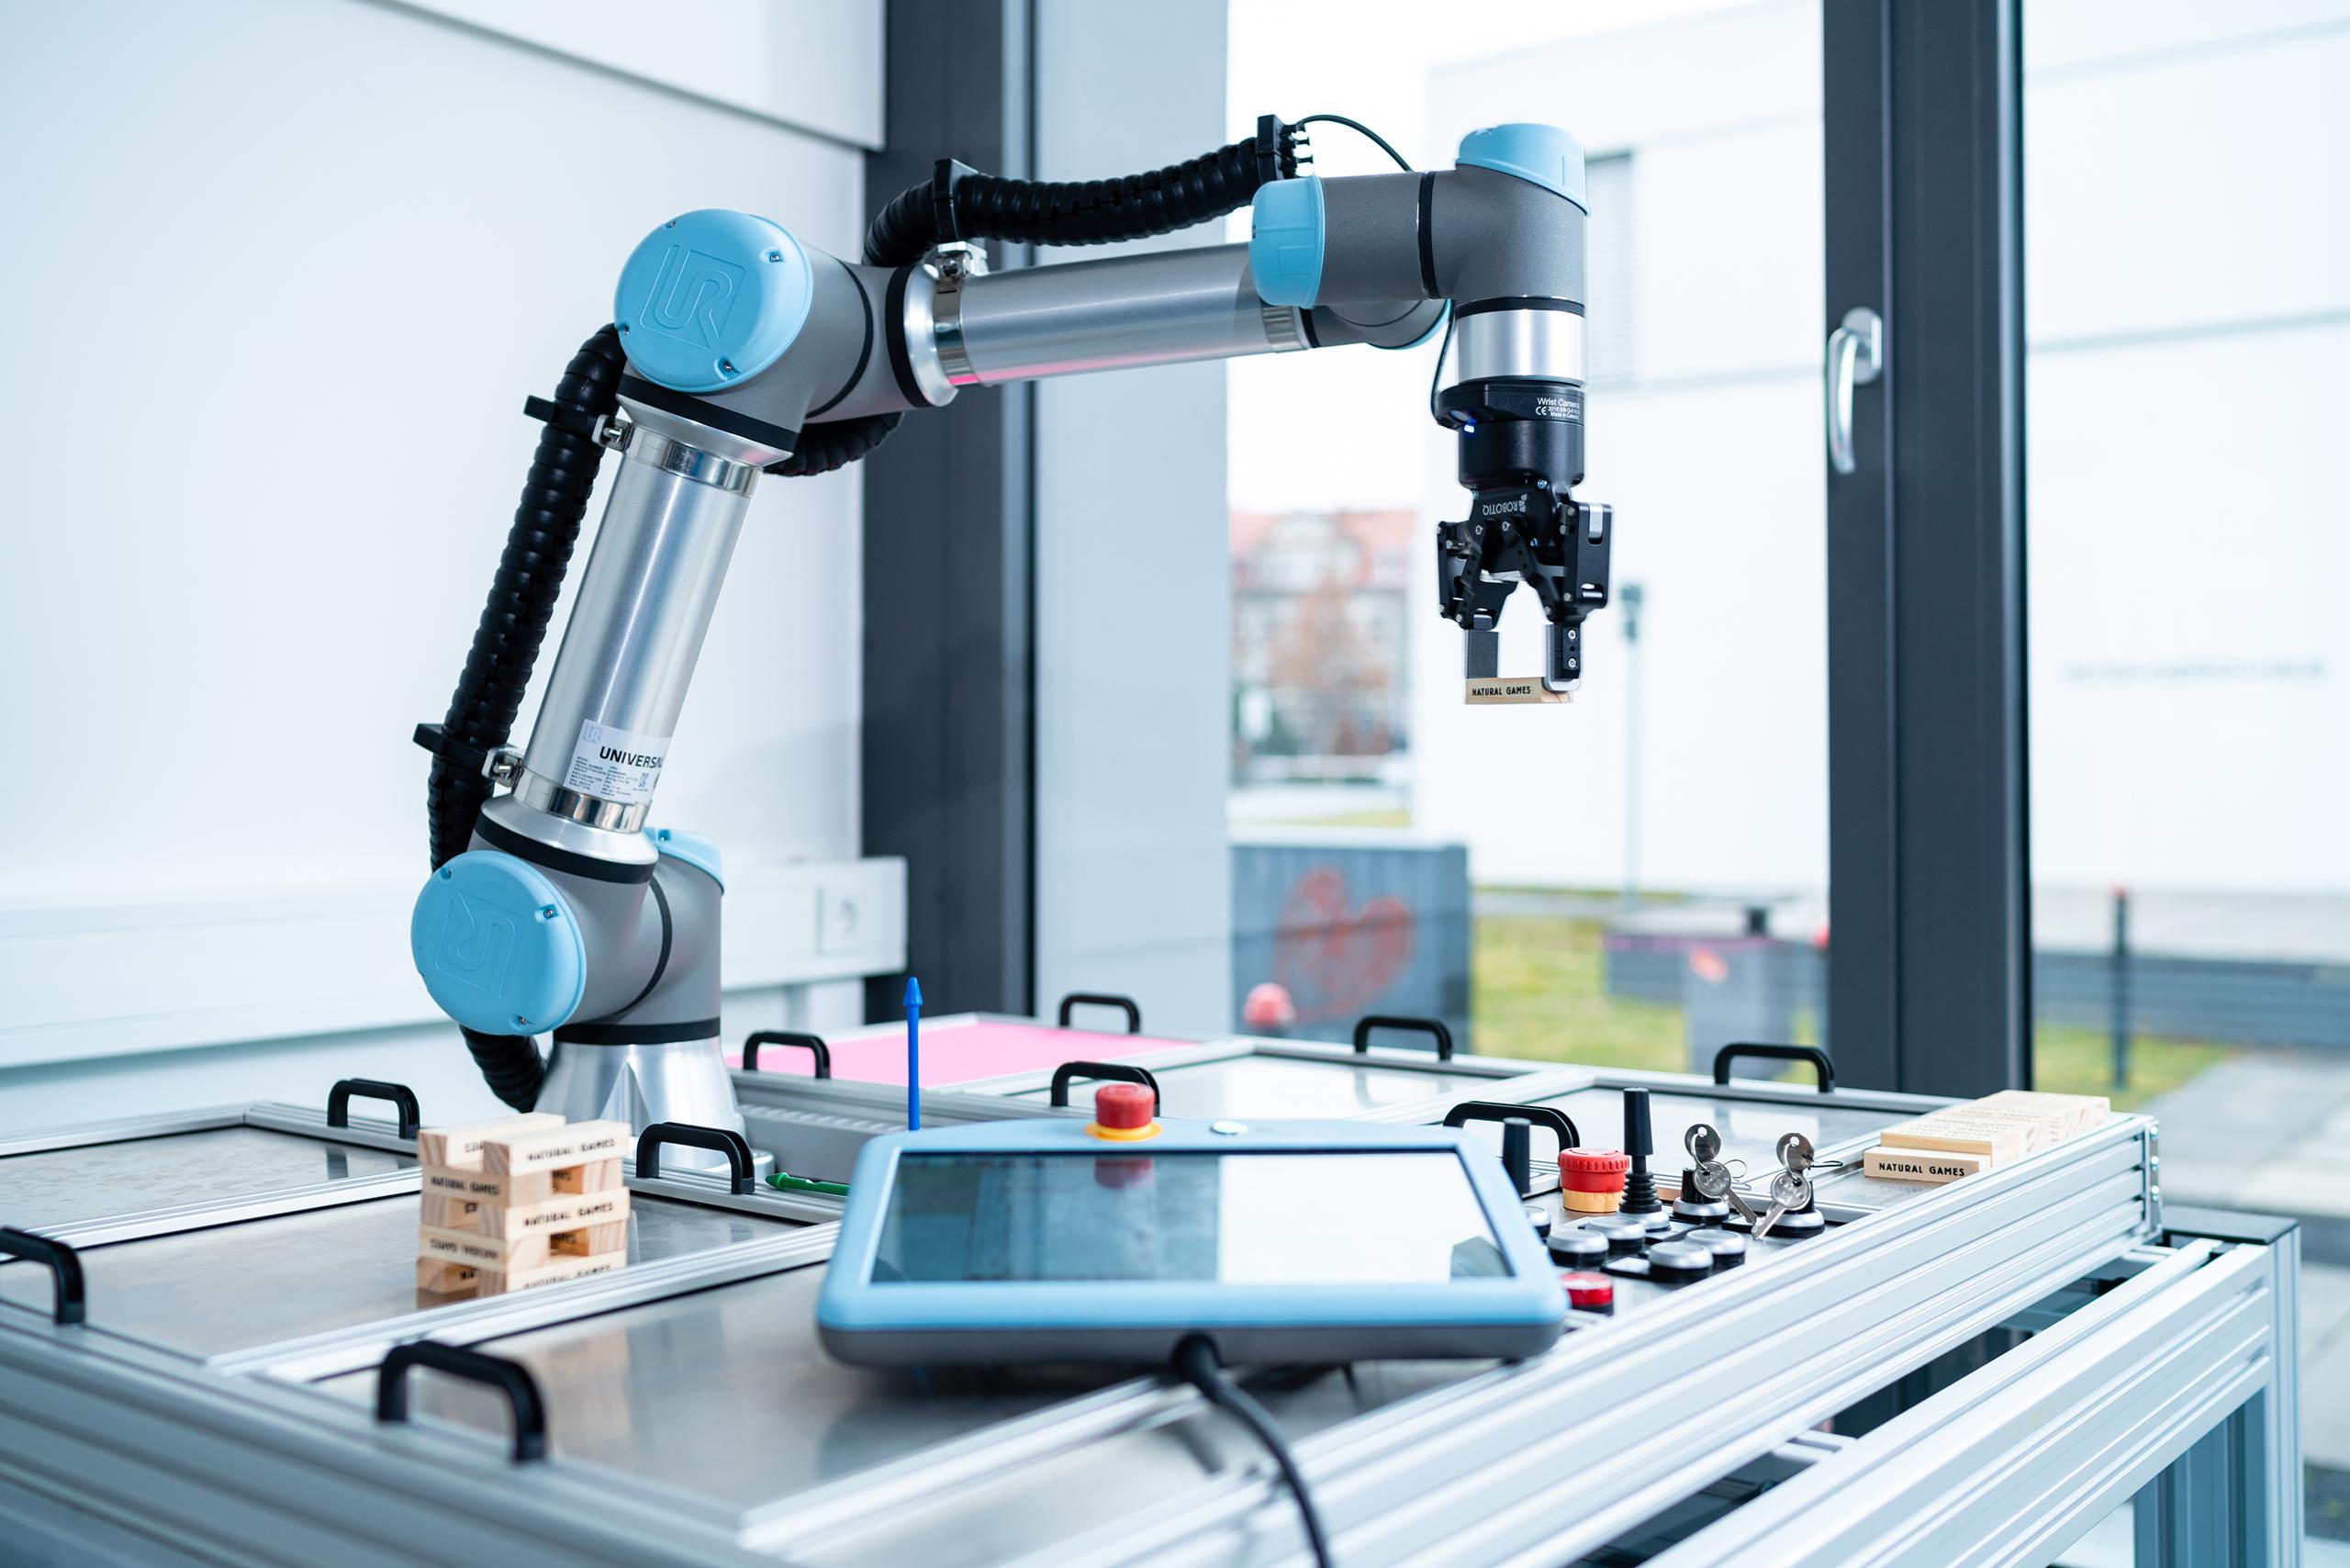 kollaborationsfähigeer Roboter (COBOT)